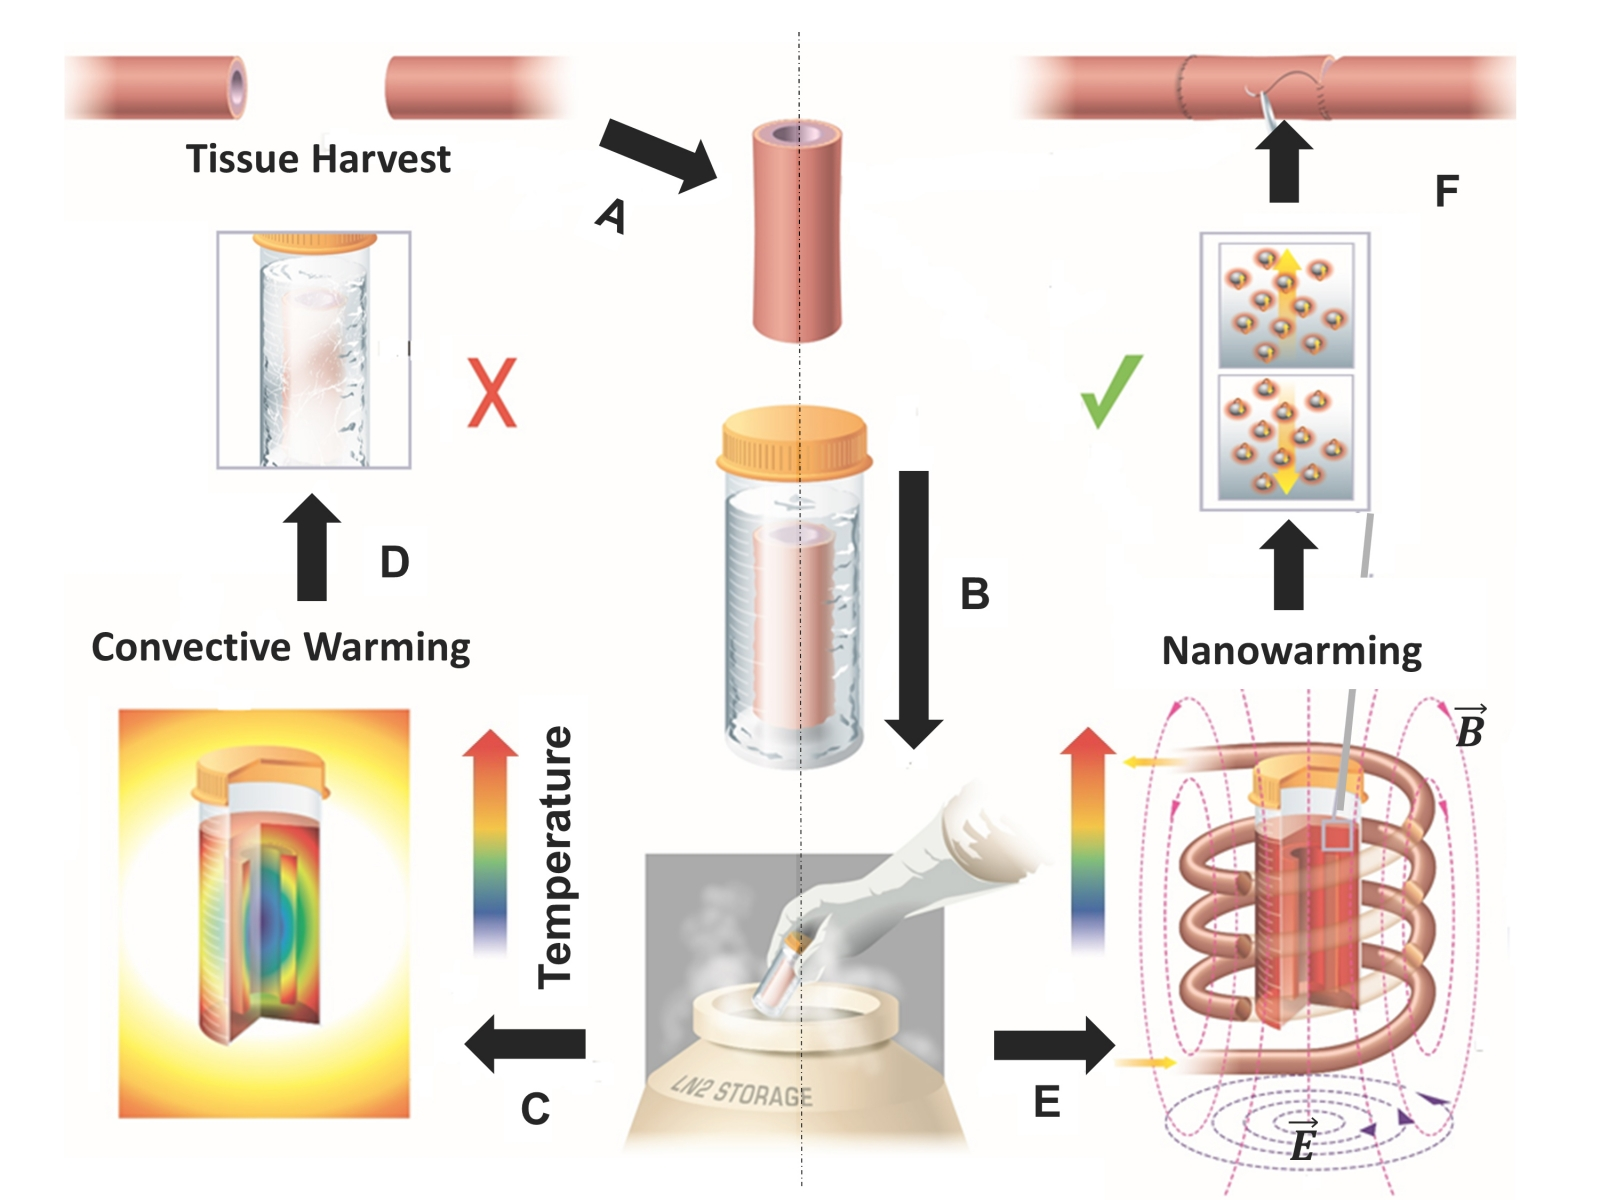 nanowarming cryogenics